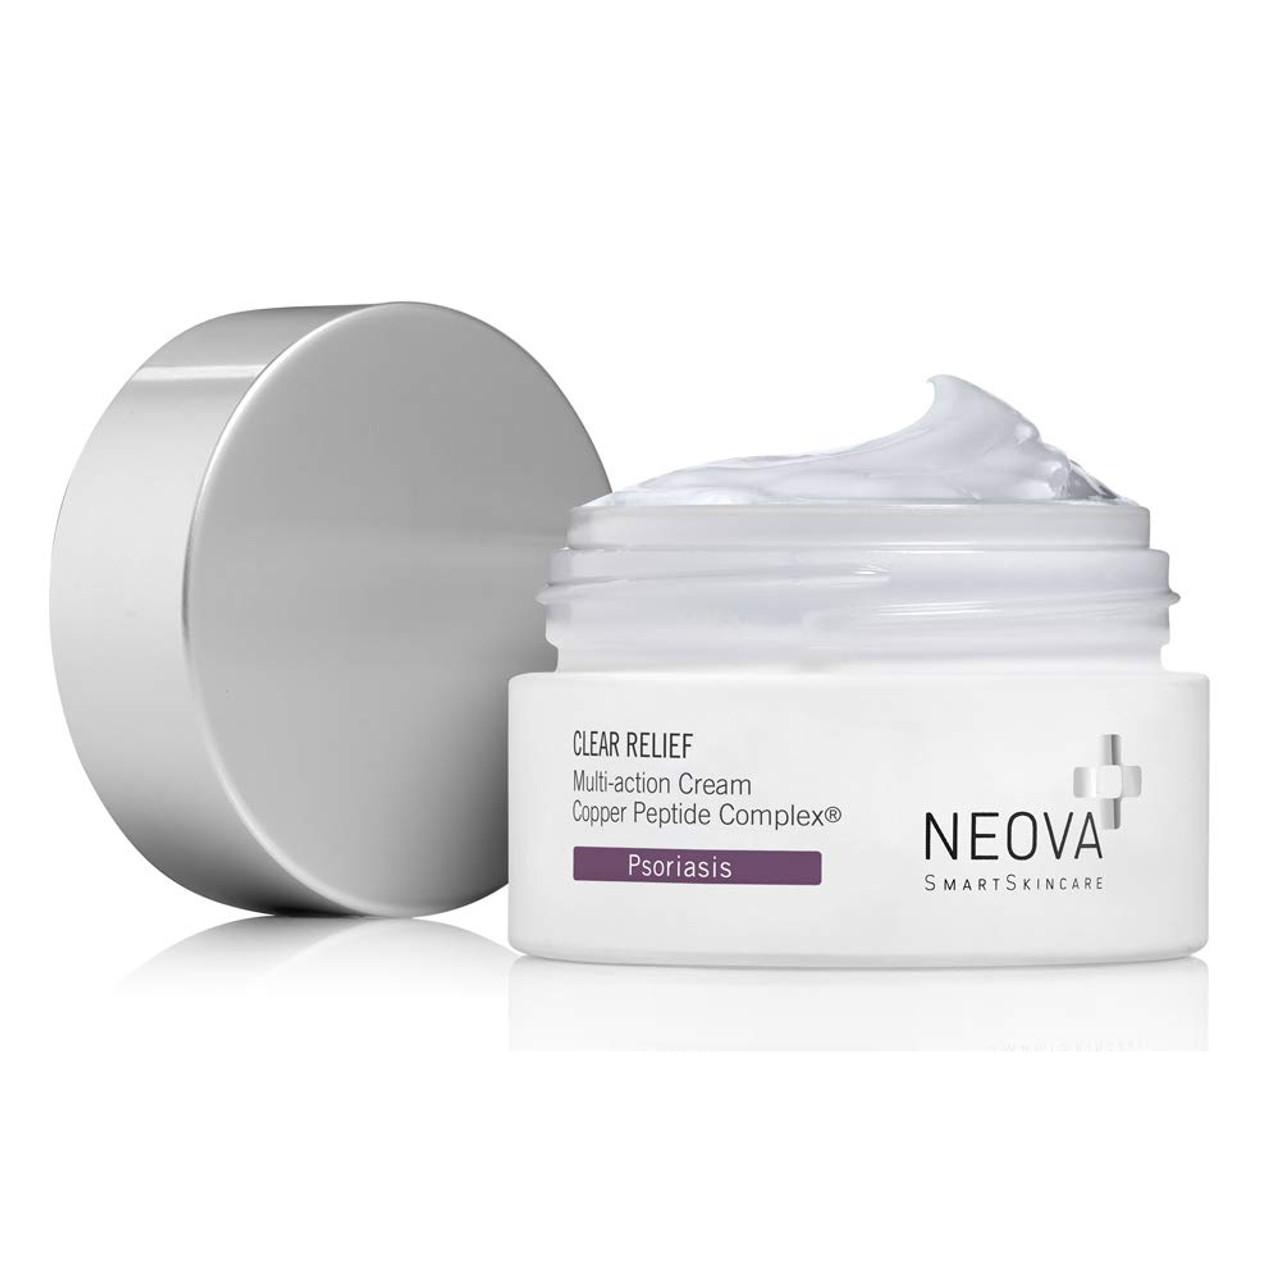 Neova Clear Relief